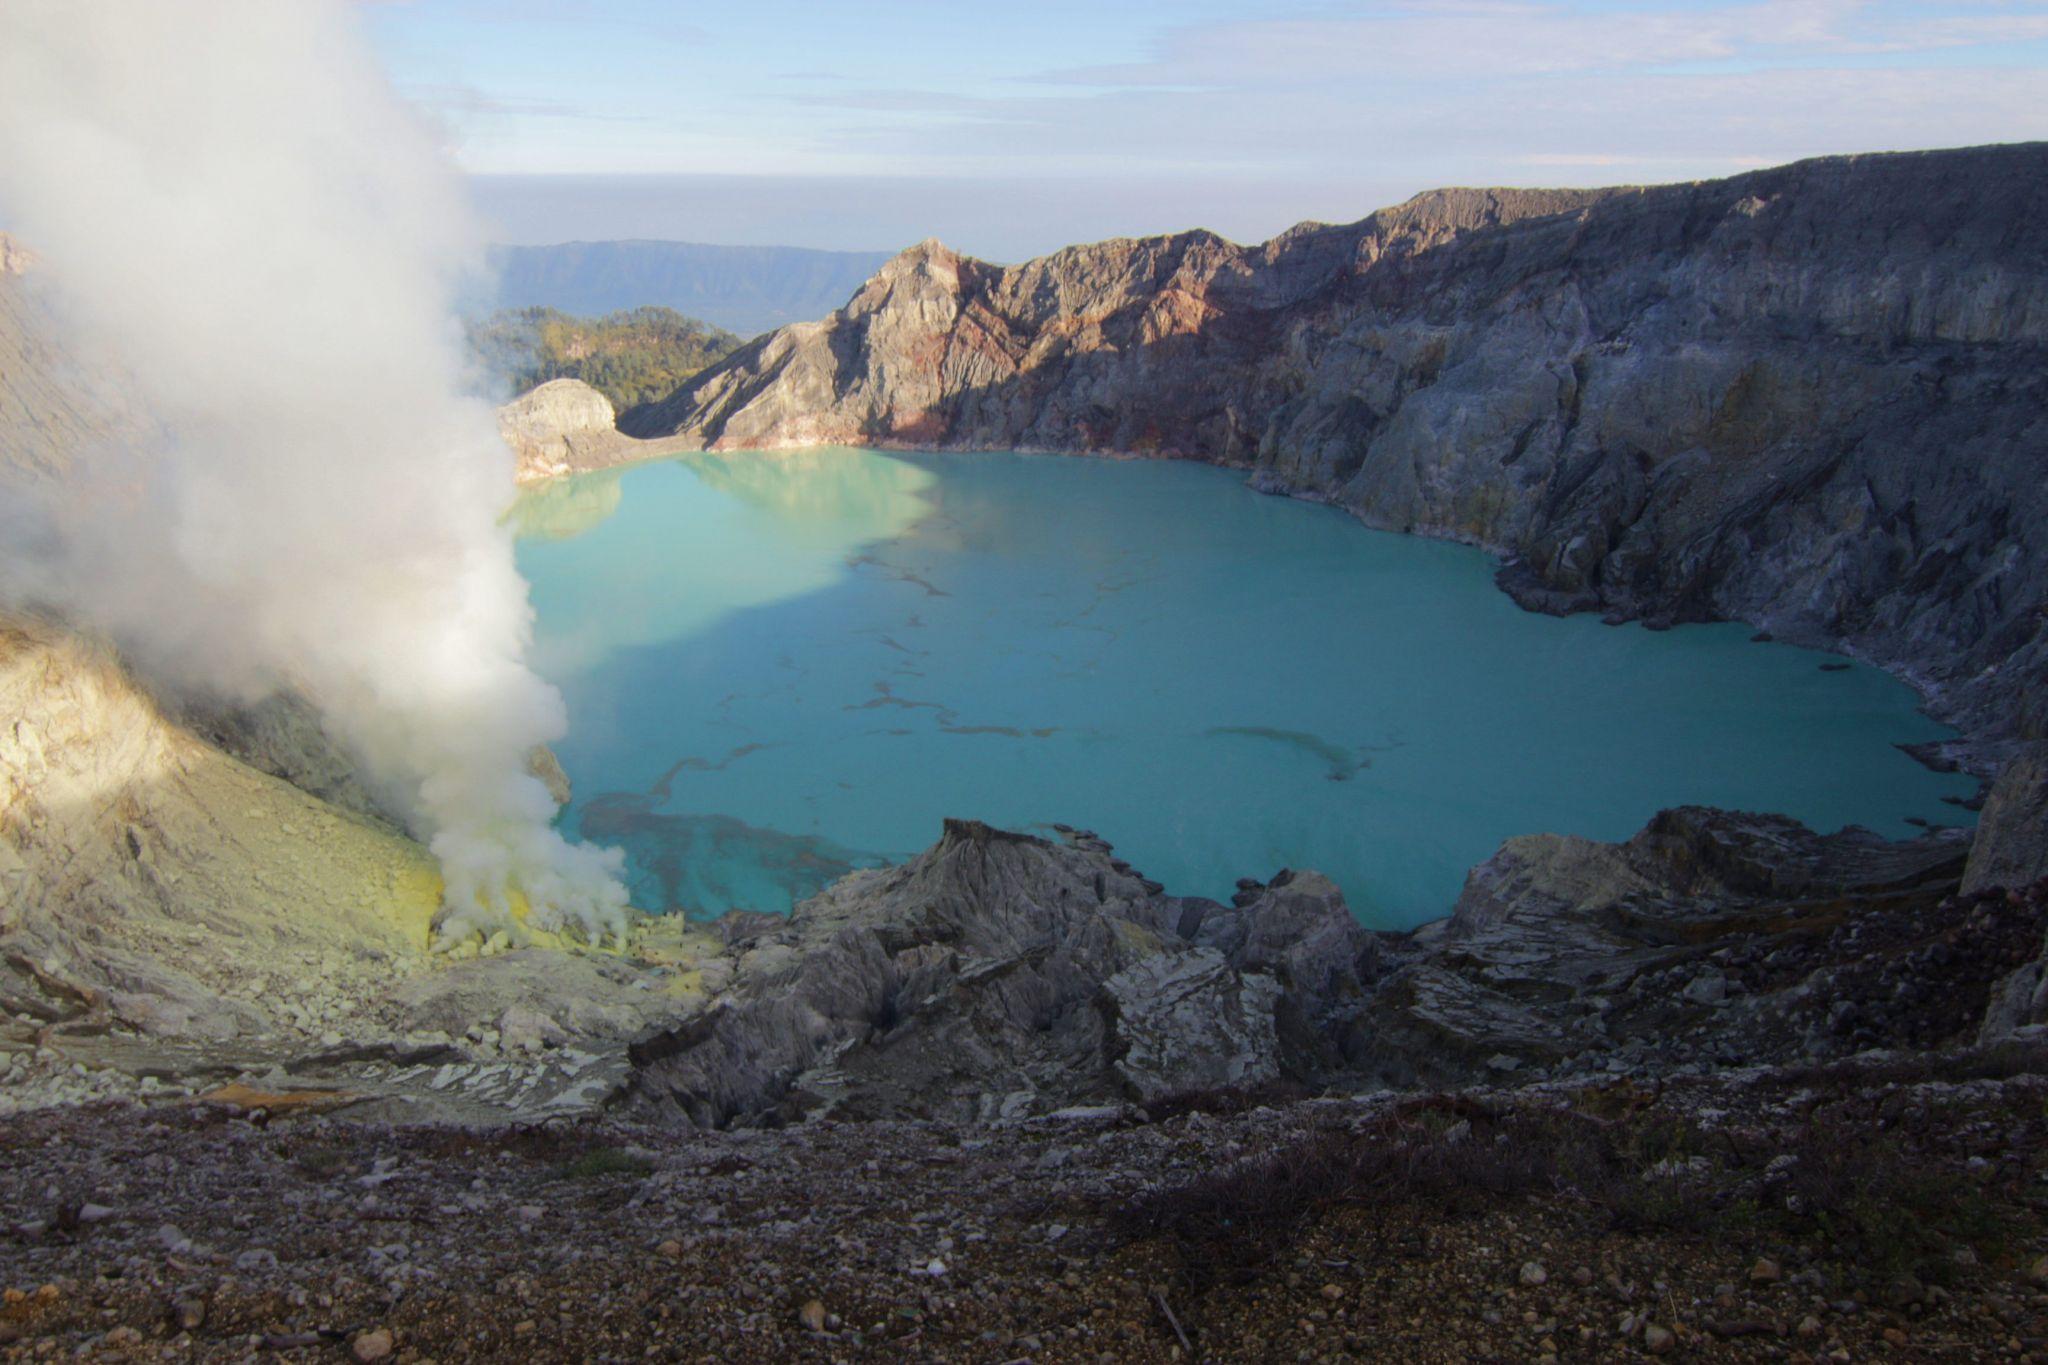 Ijen crater, Indonesia, Indonesia